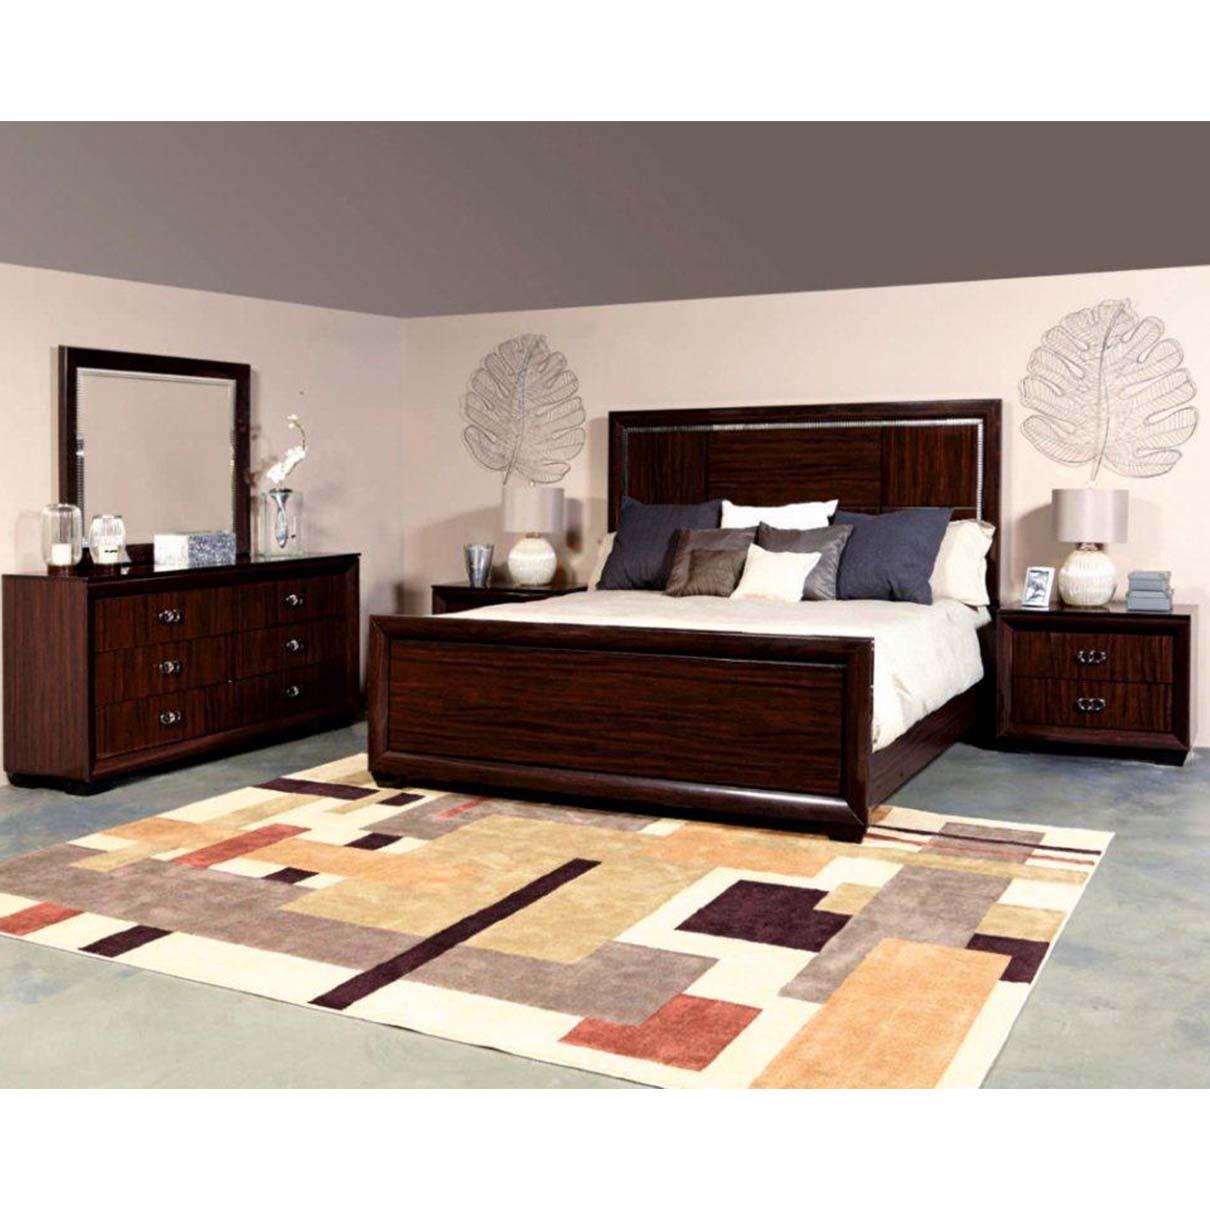 Estrada BRS decor and design bedroom suites